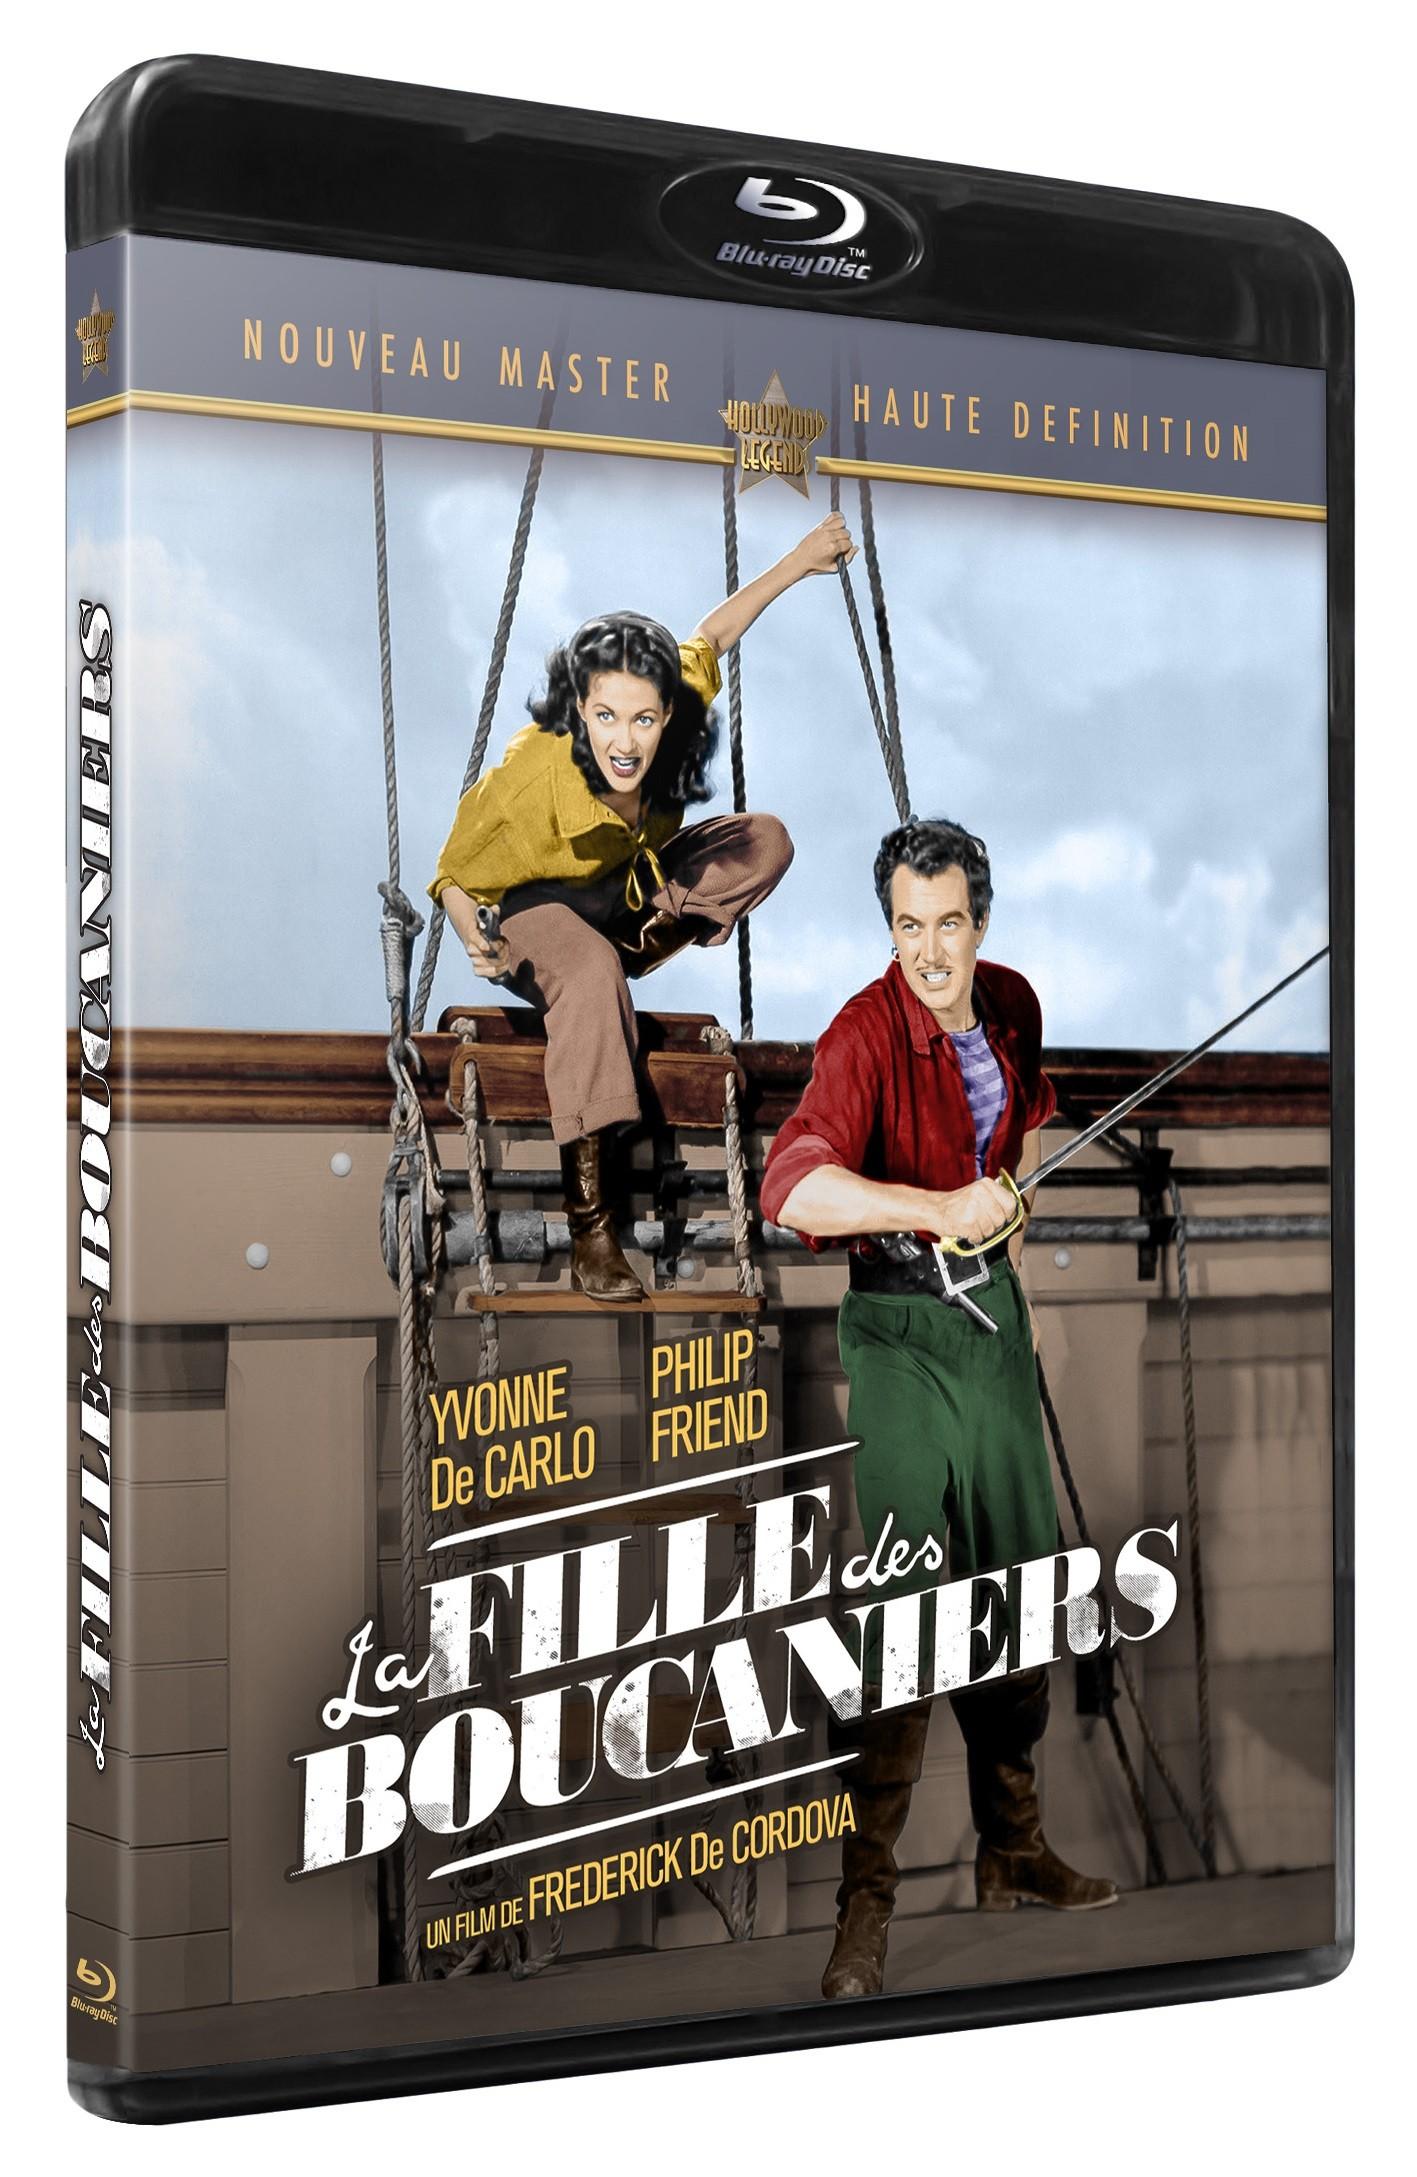 LA FILLE DES BOUCANIERS - BRD